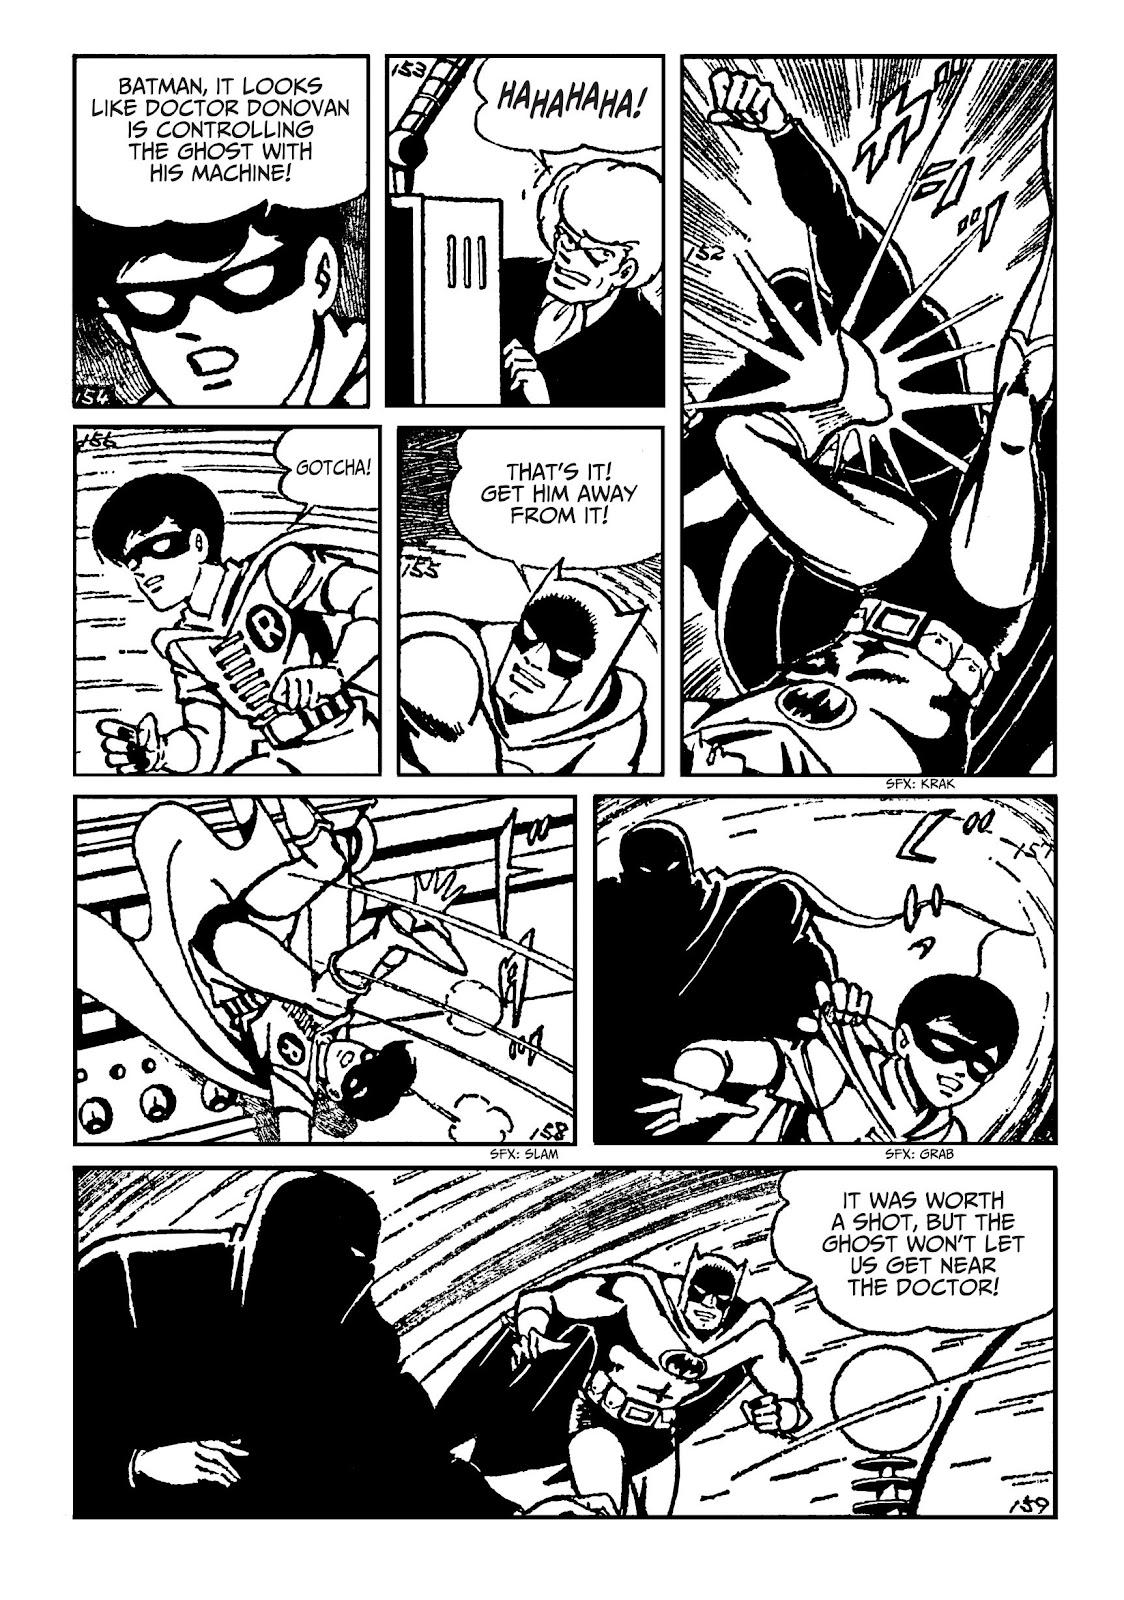 Read online Batman - The Jiro Kuwata Batmanga comic -  Issue #51 - 26